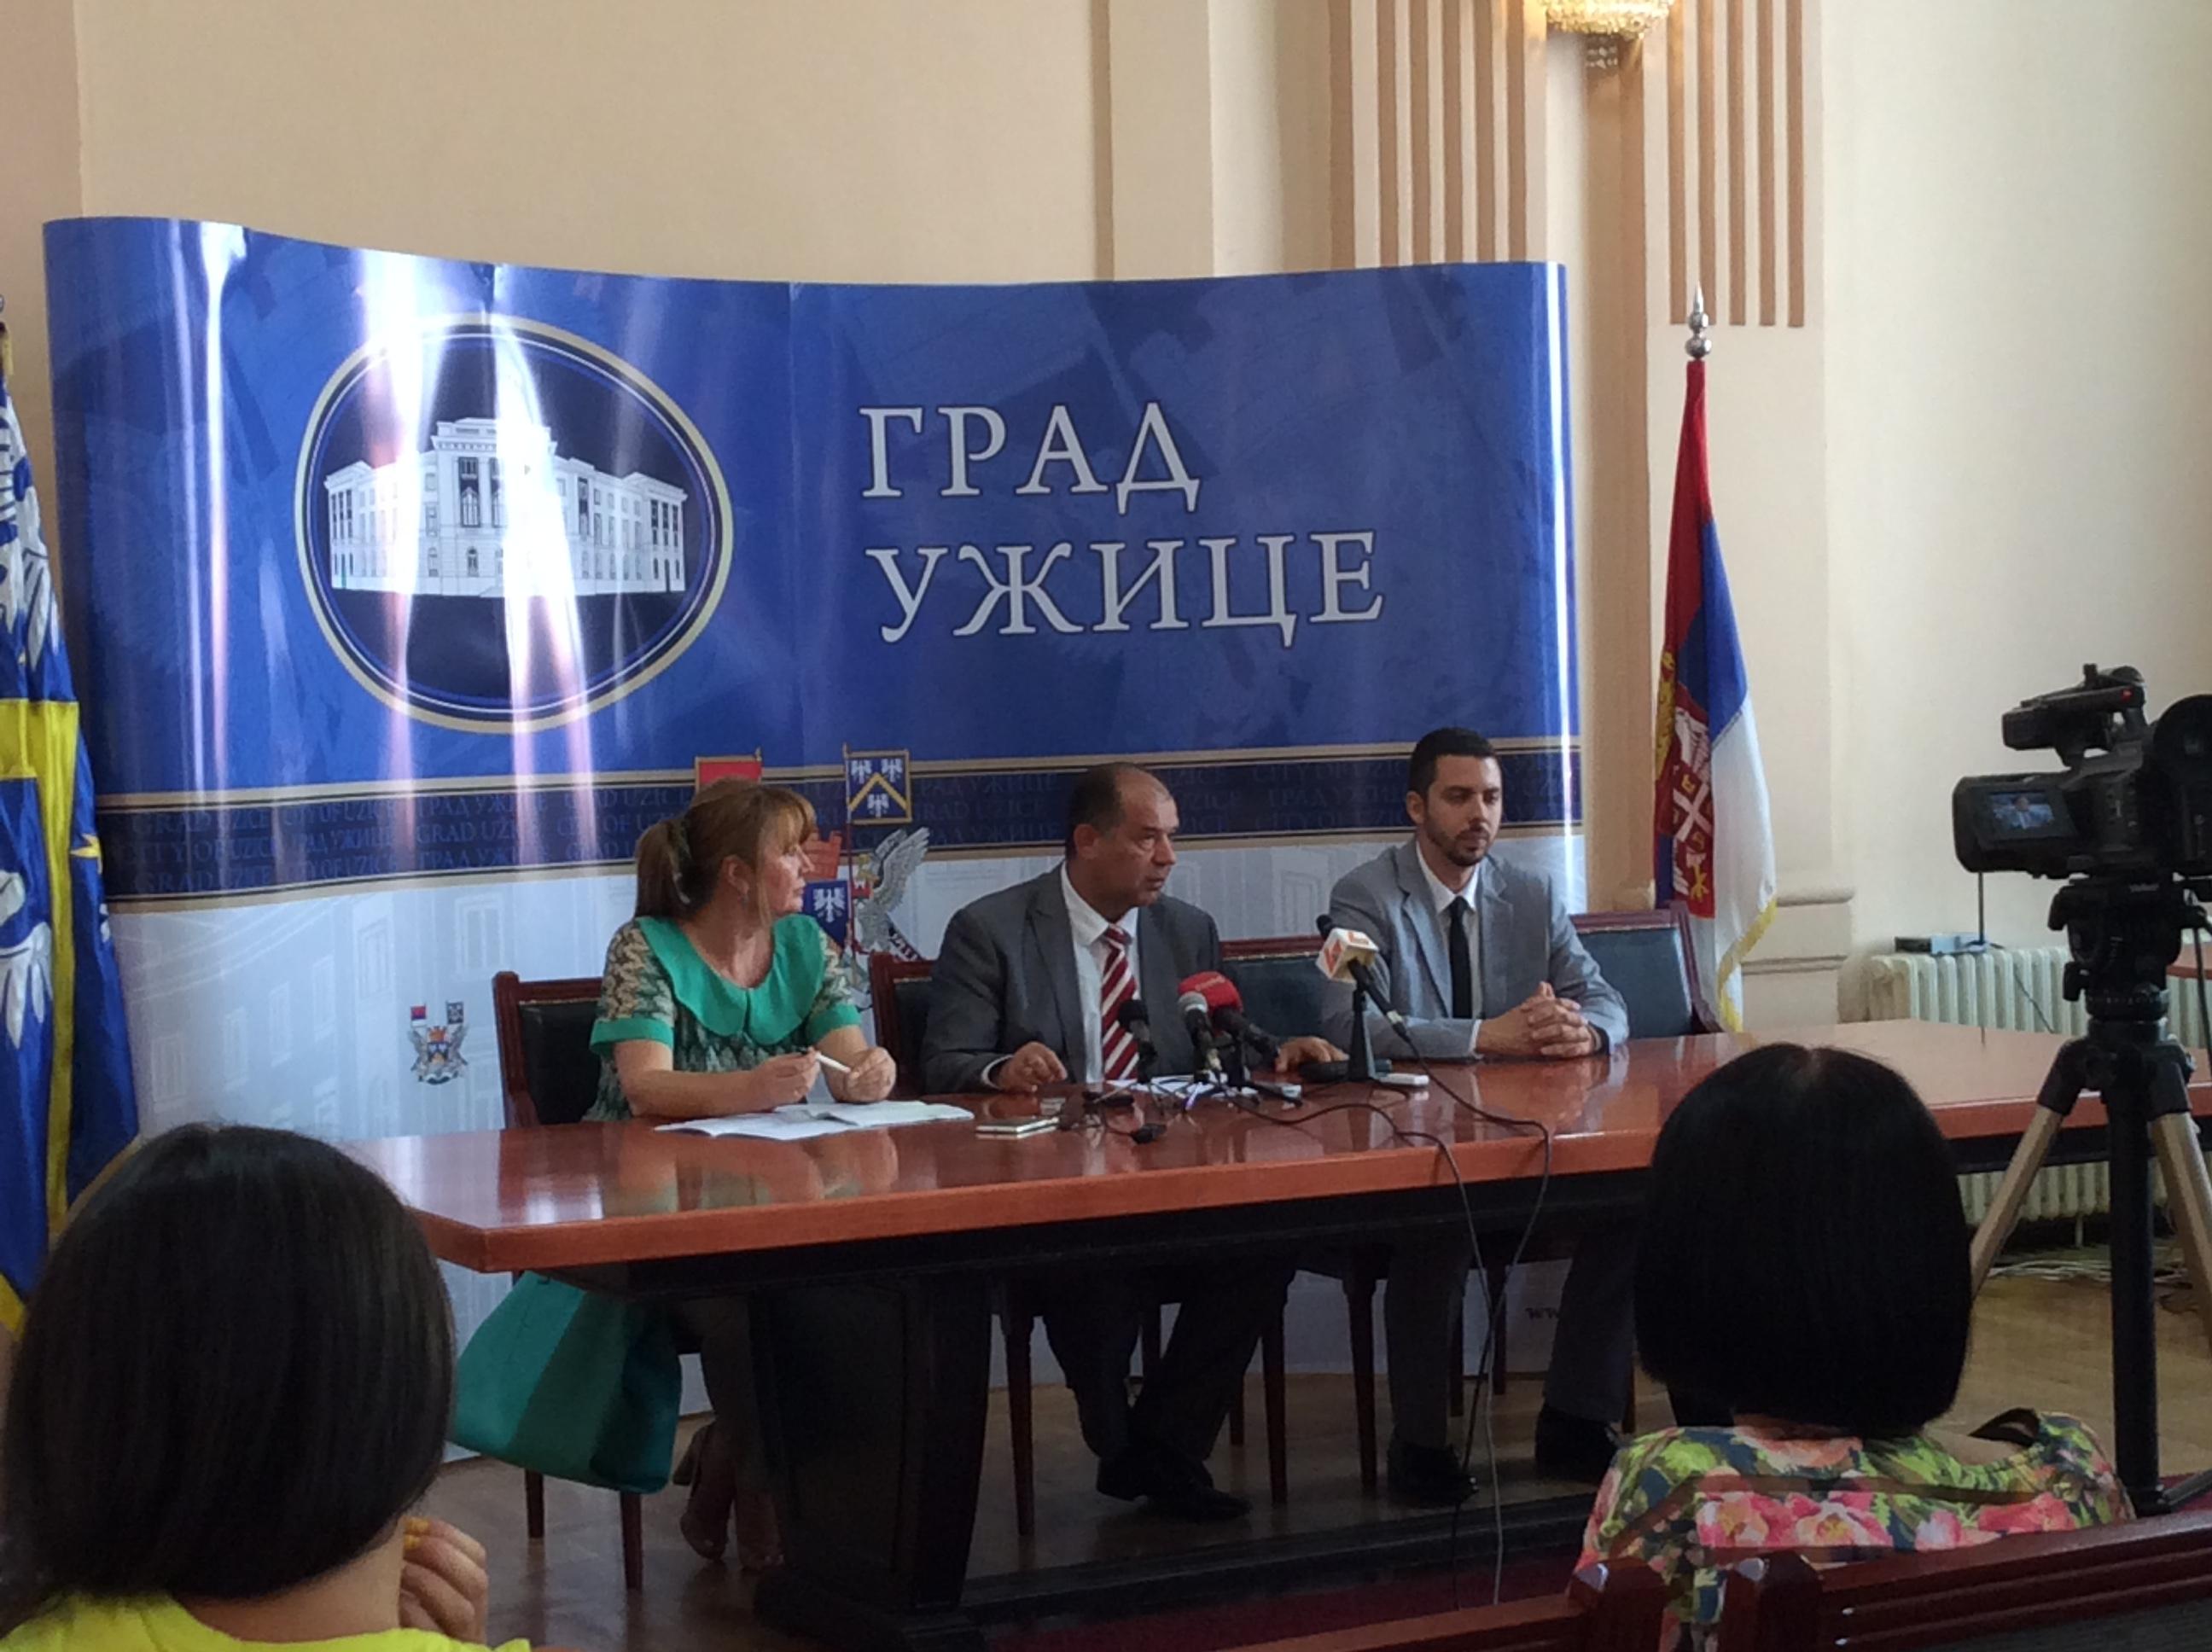 Lela Kovačević, direktorka Vrtića, Tihomir Petković, gradonačelnik i Petar Blagojević, član Gradskog veća za obrazovanje Foto--URP